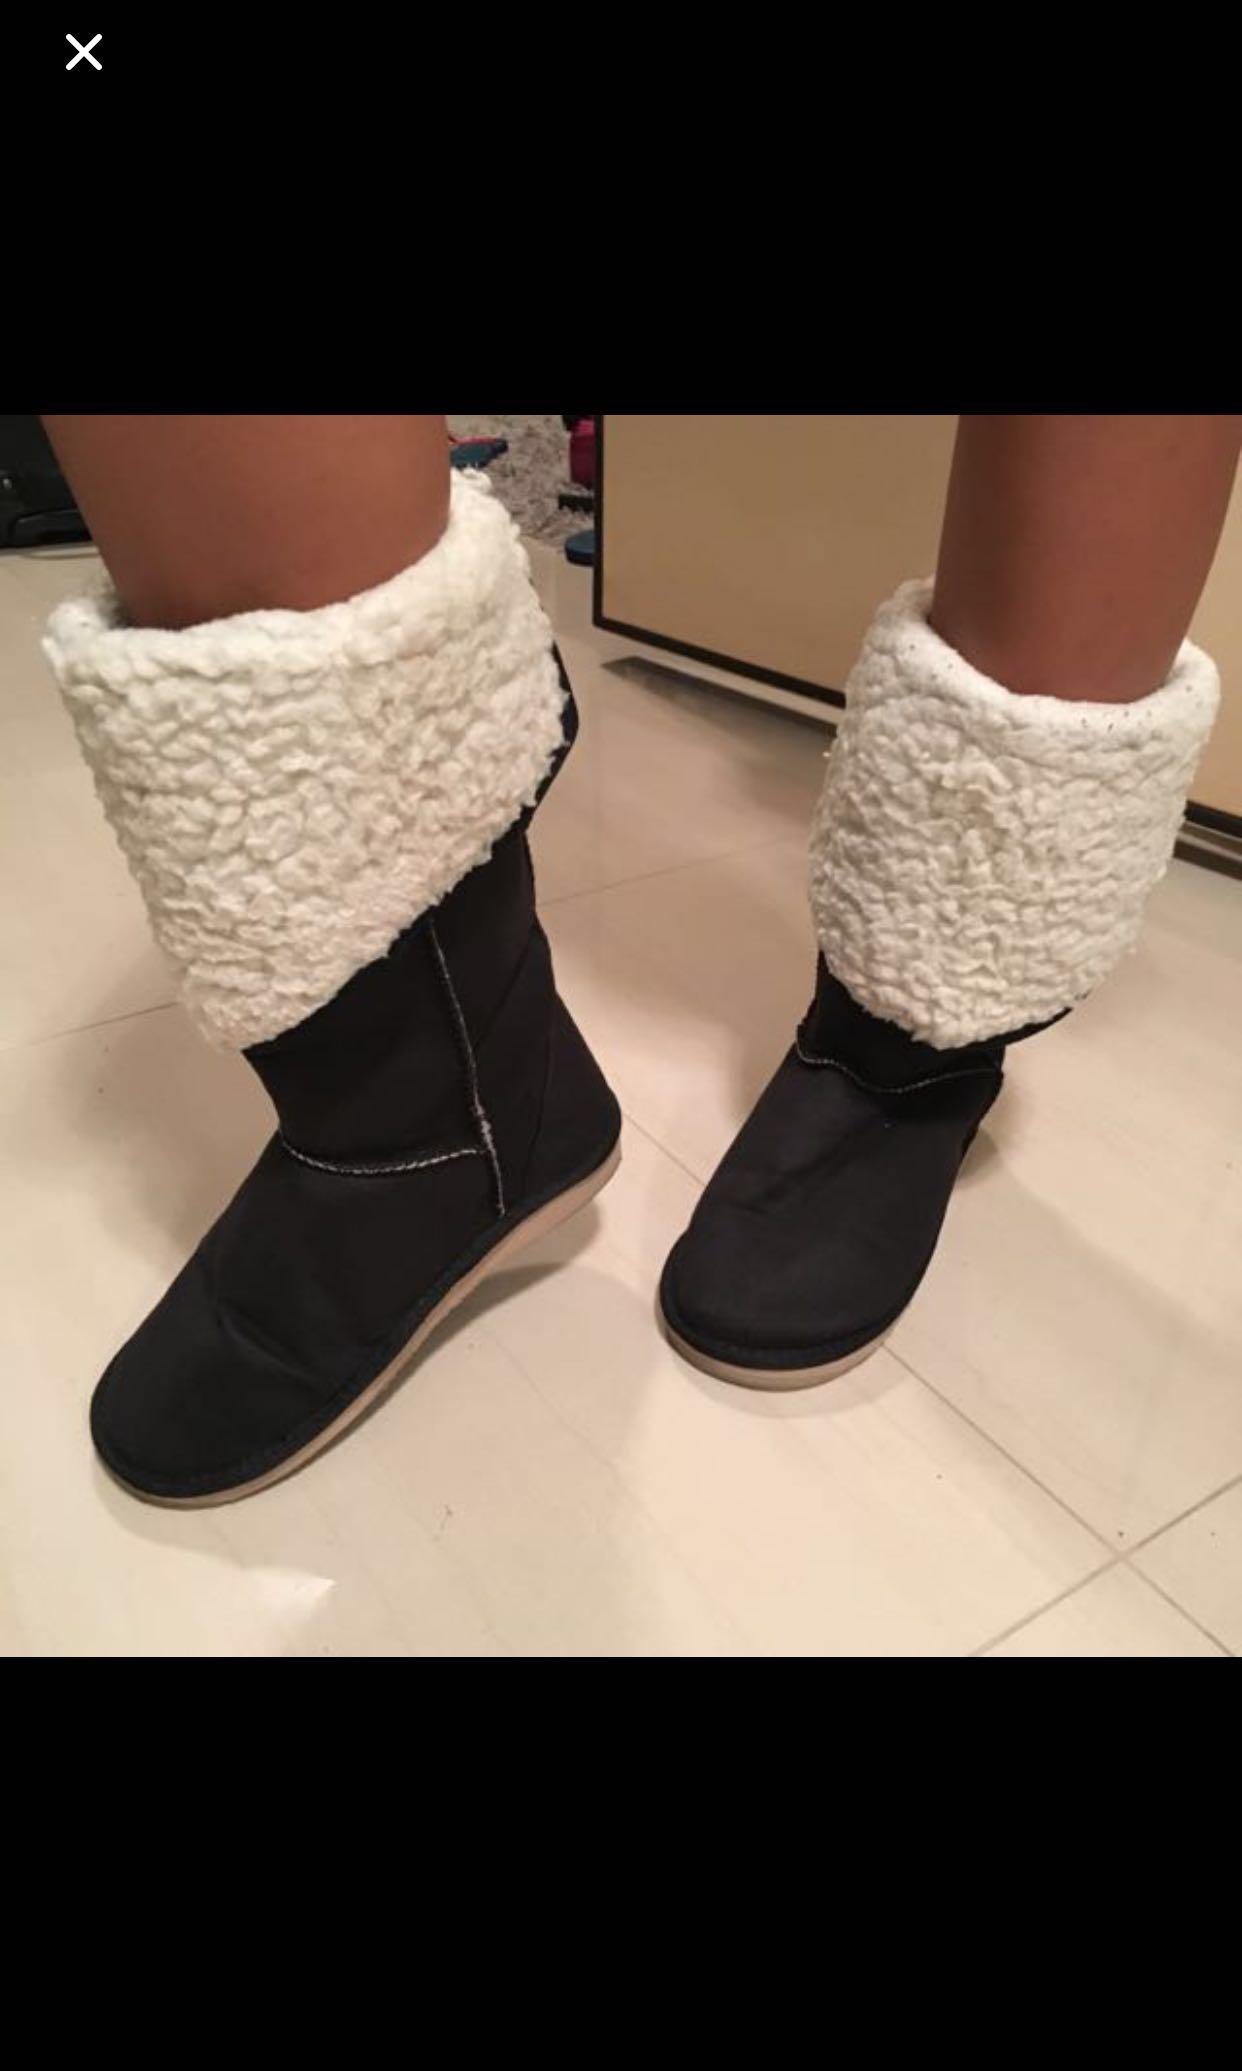 8ea4b95a878 Muji UGG Style Winter Boots